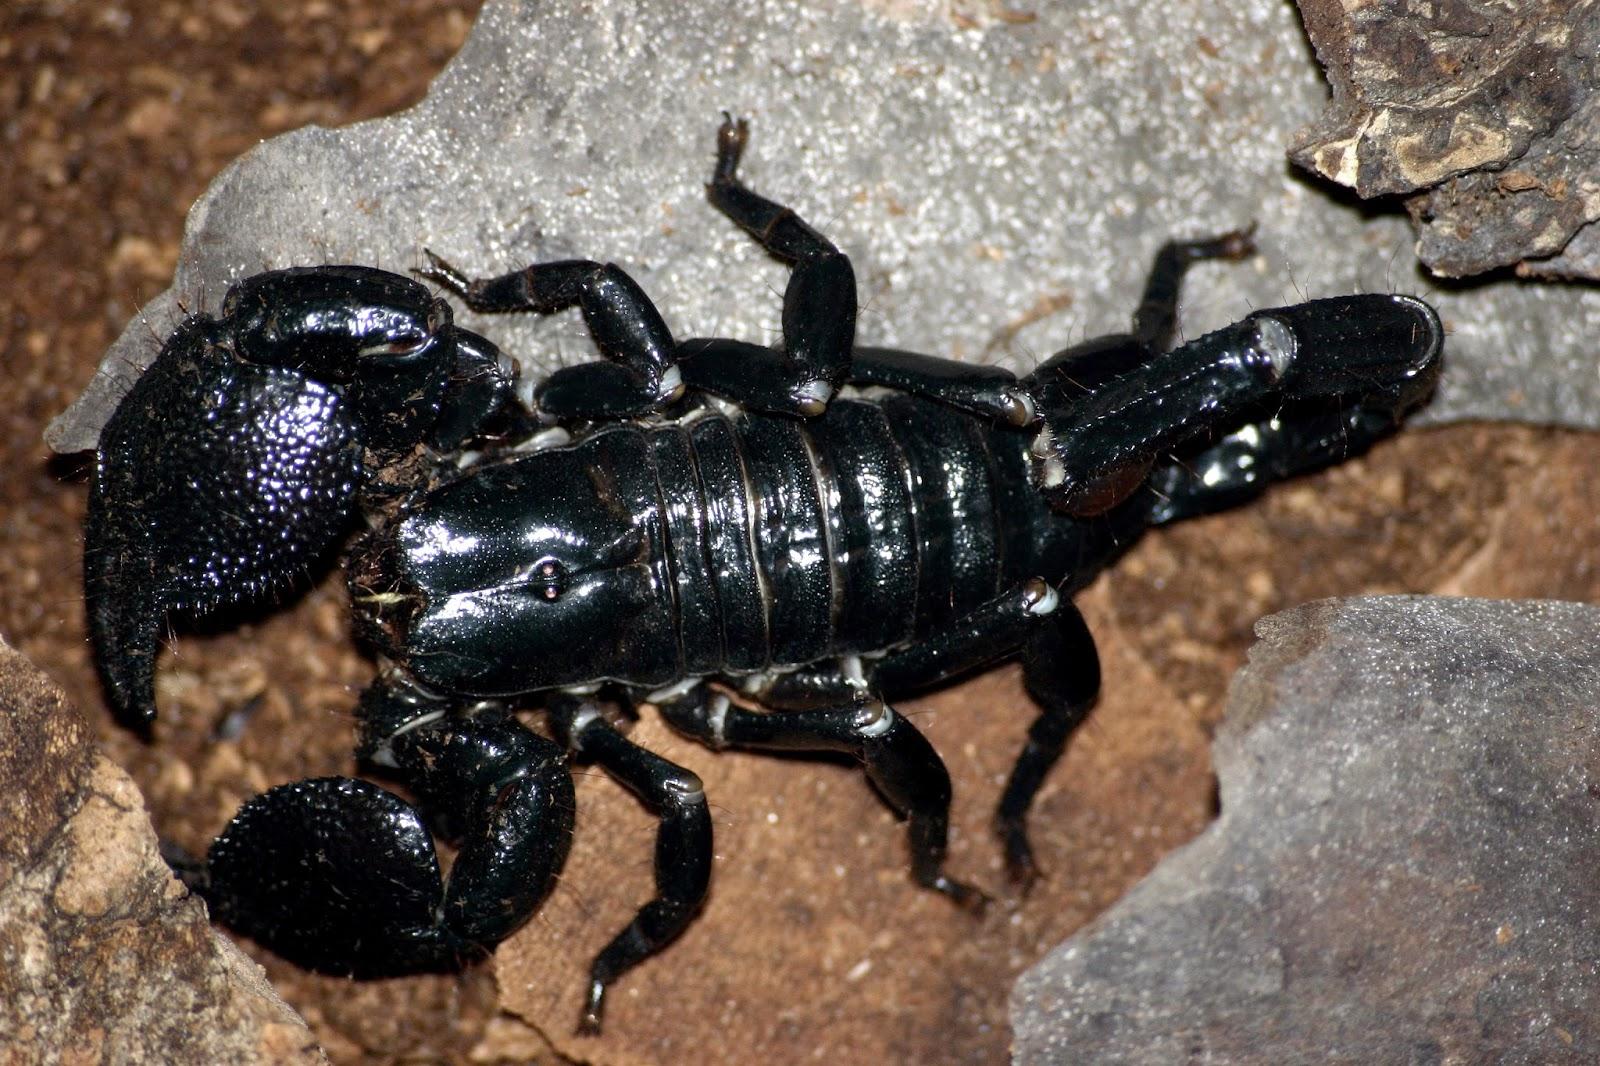 http://zoozon.blogspot.com/2015/03/scorpions-animal-pictures-3.html